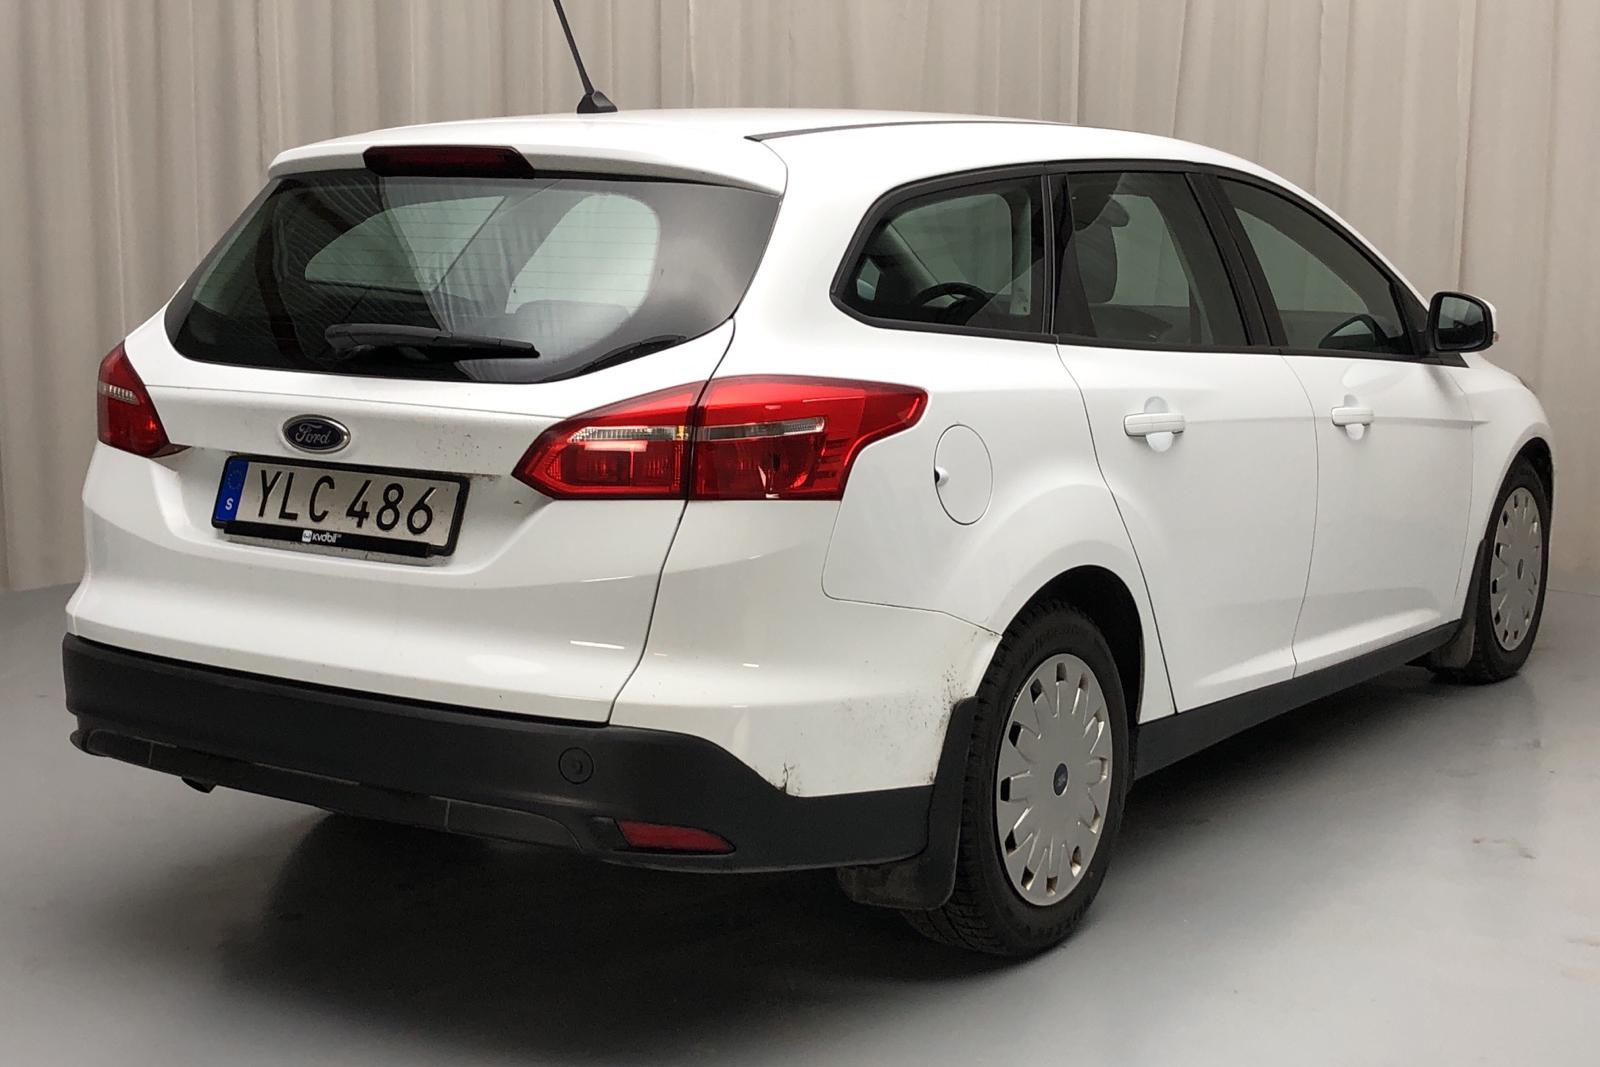 Ford Focus 1.5 TDCi ECOnetic Kombi (105hk) - 72 200 km - Manual - white - 2017